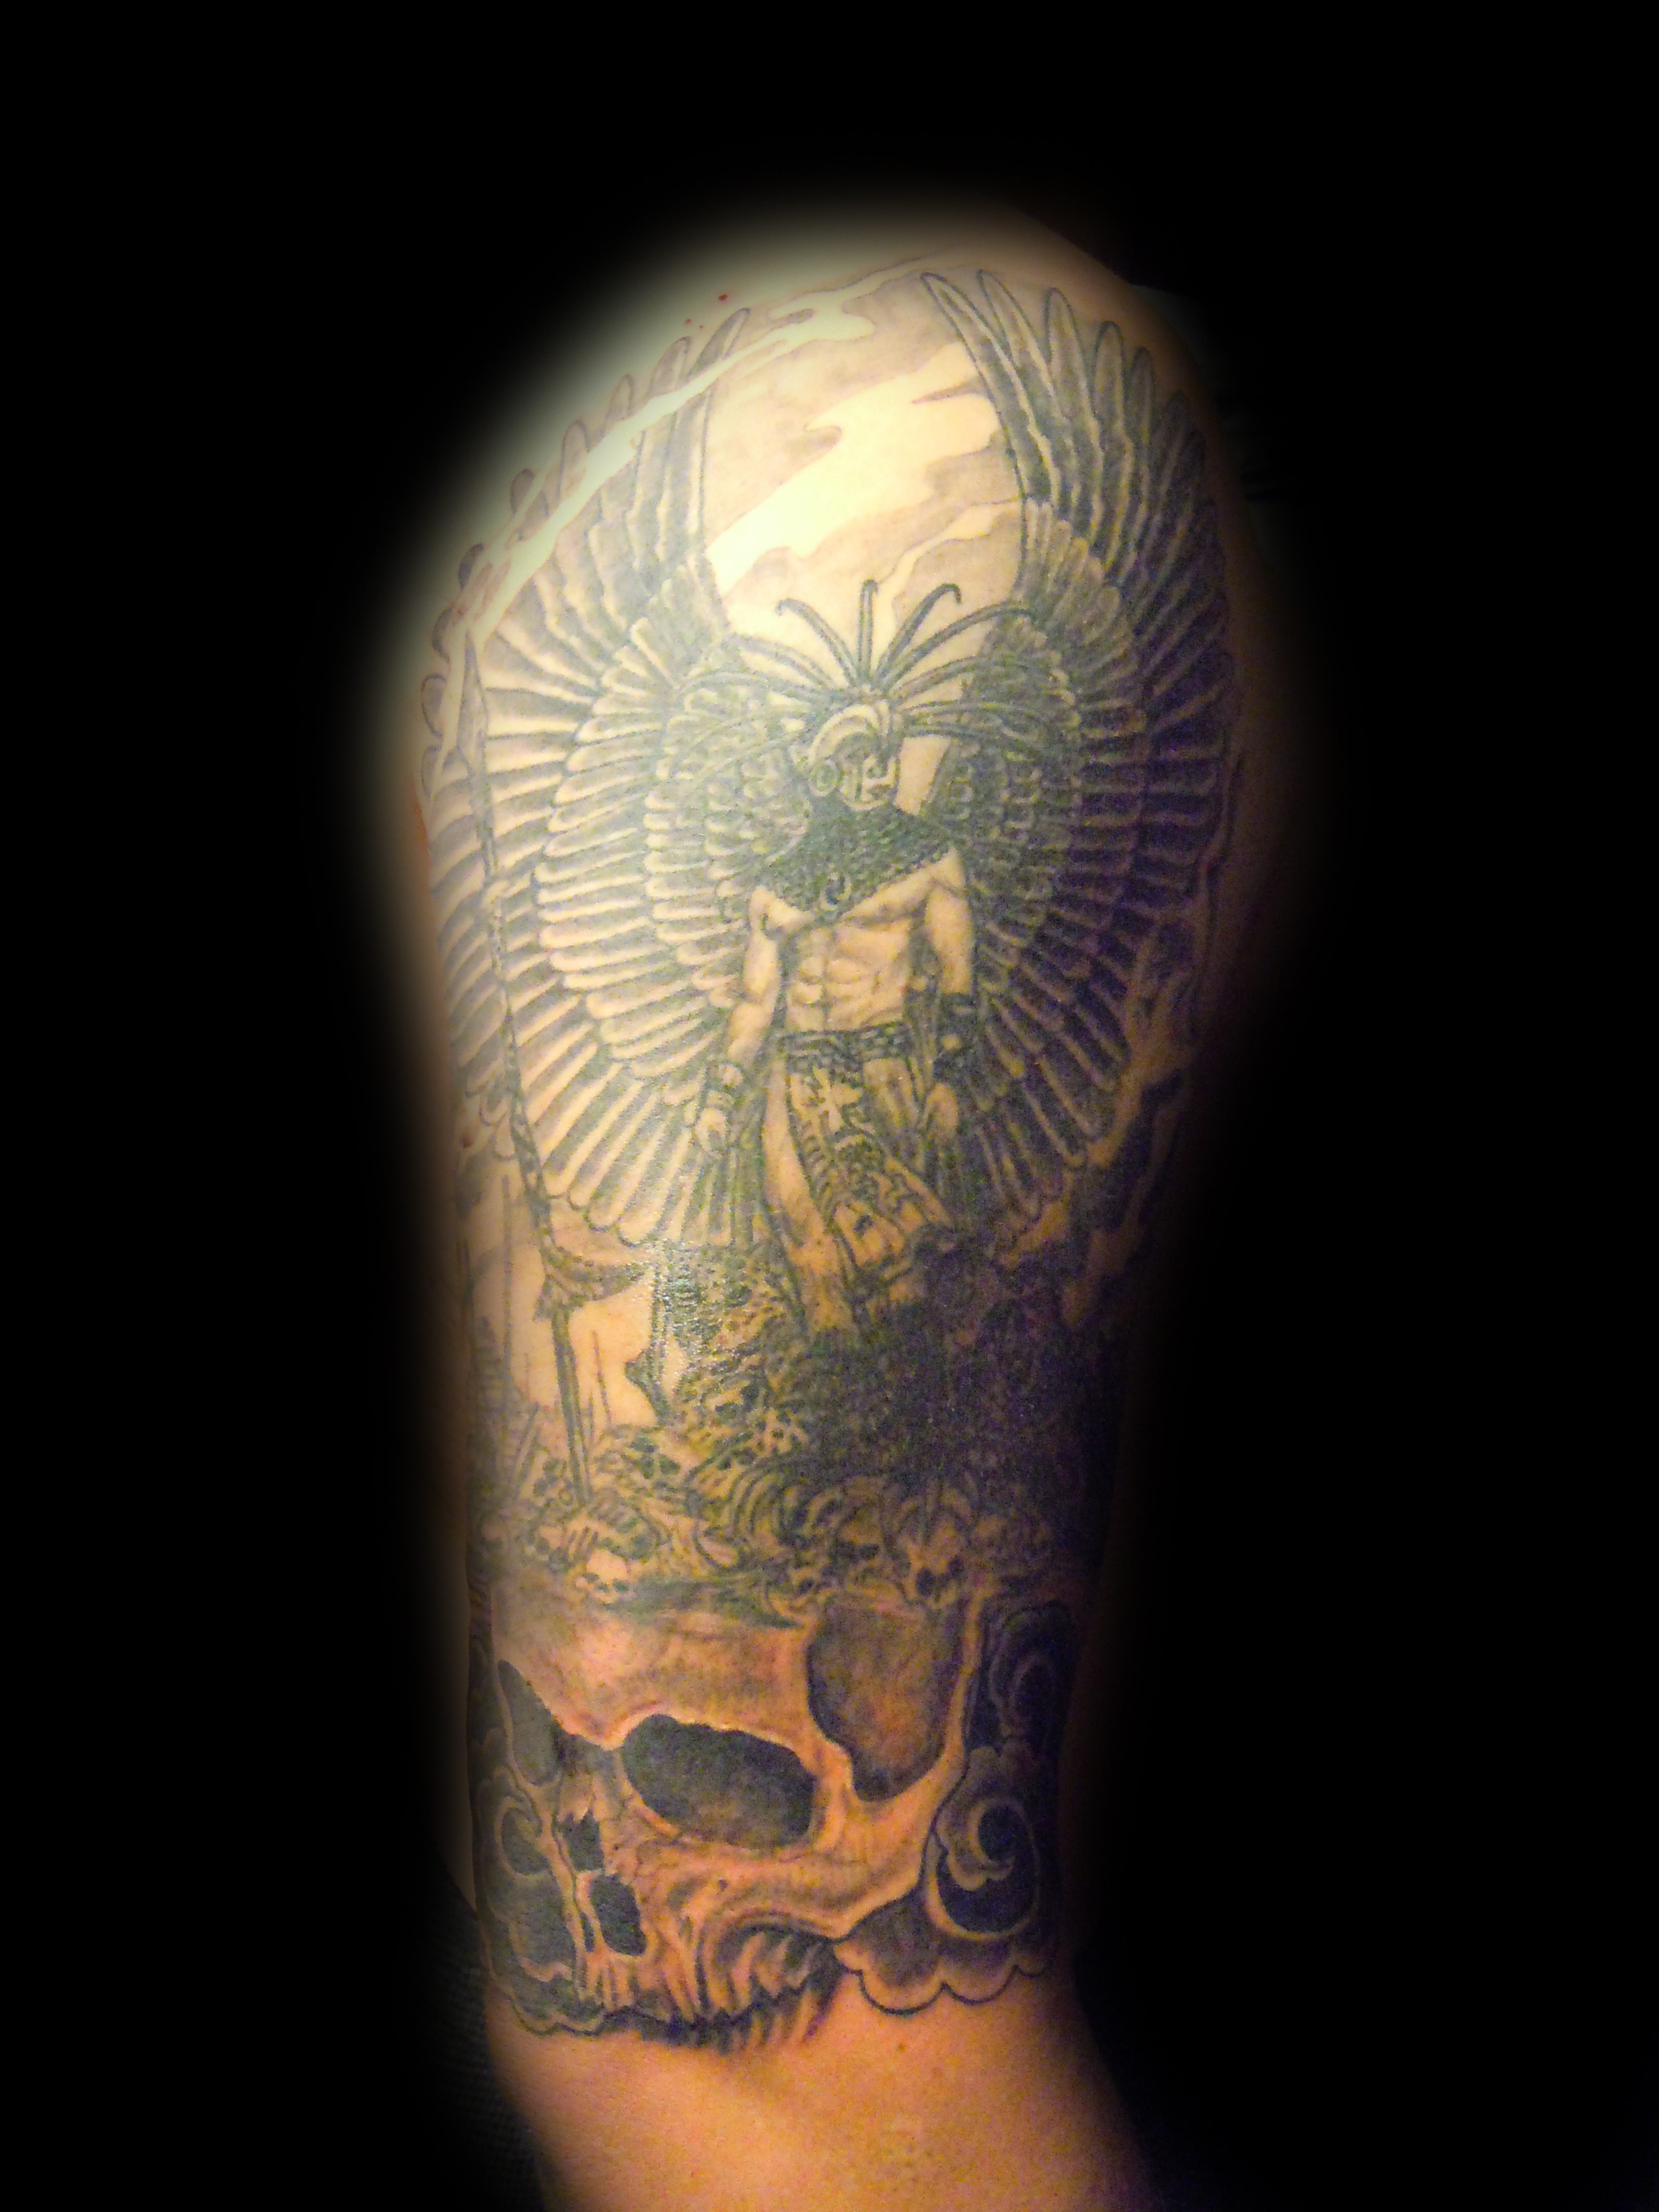 Tattoos by Nick James | hungryboyinc